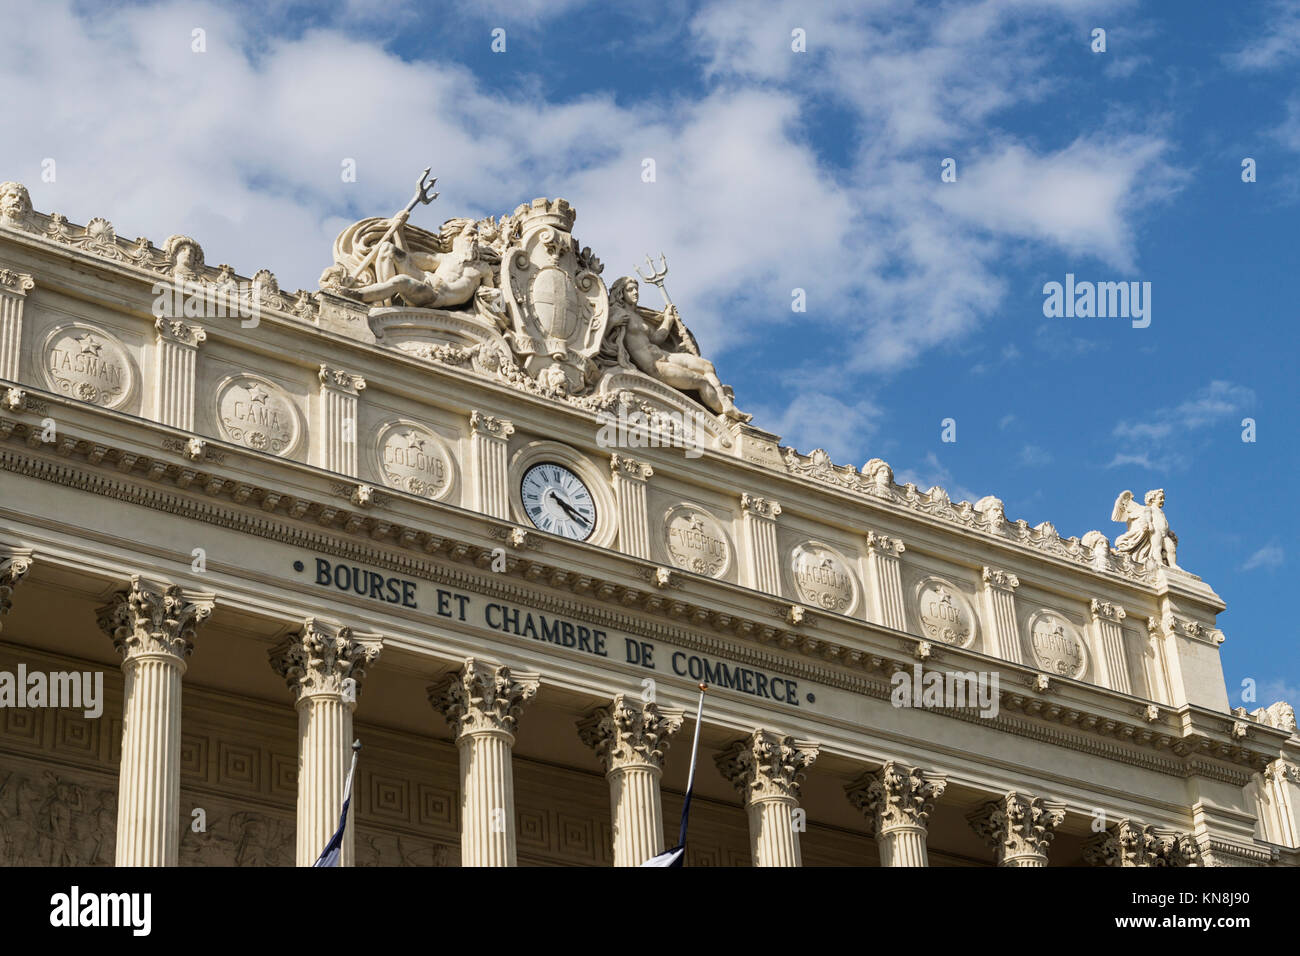 Stock Exchange building, Chambre of Commerce, Musee de la Marine, Marseille, France - Stock Image